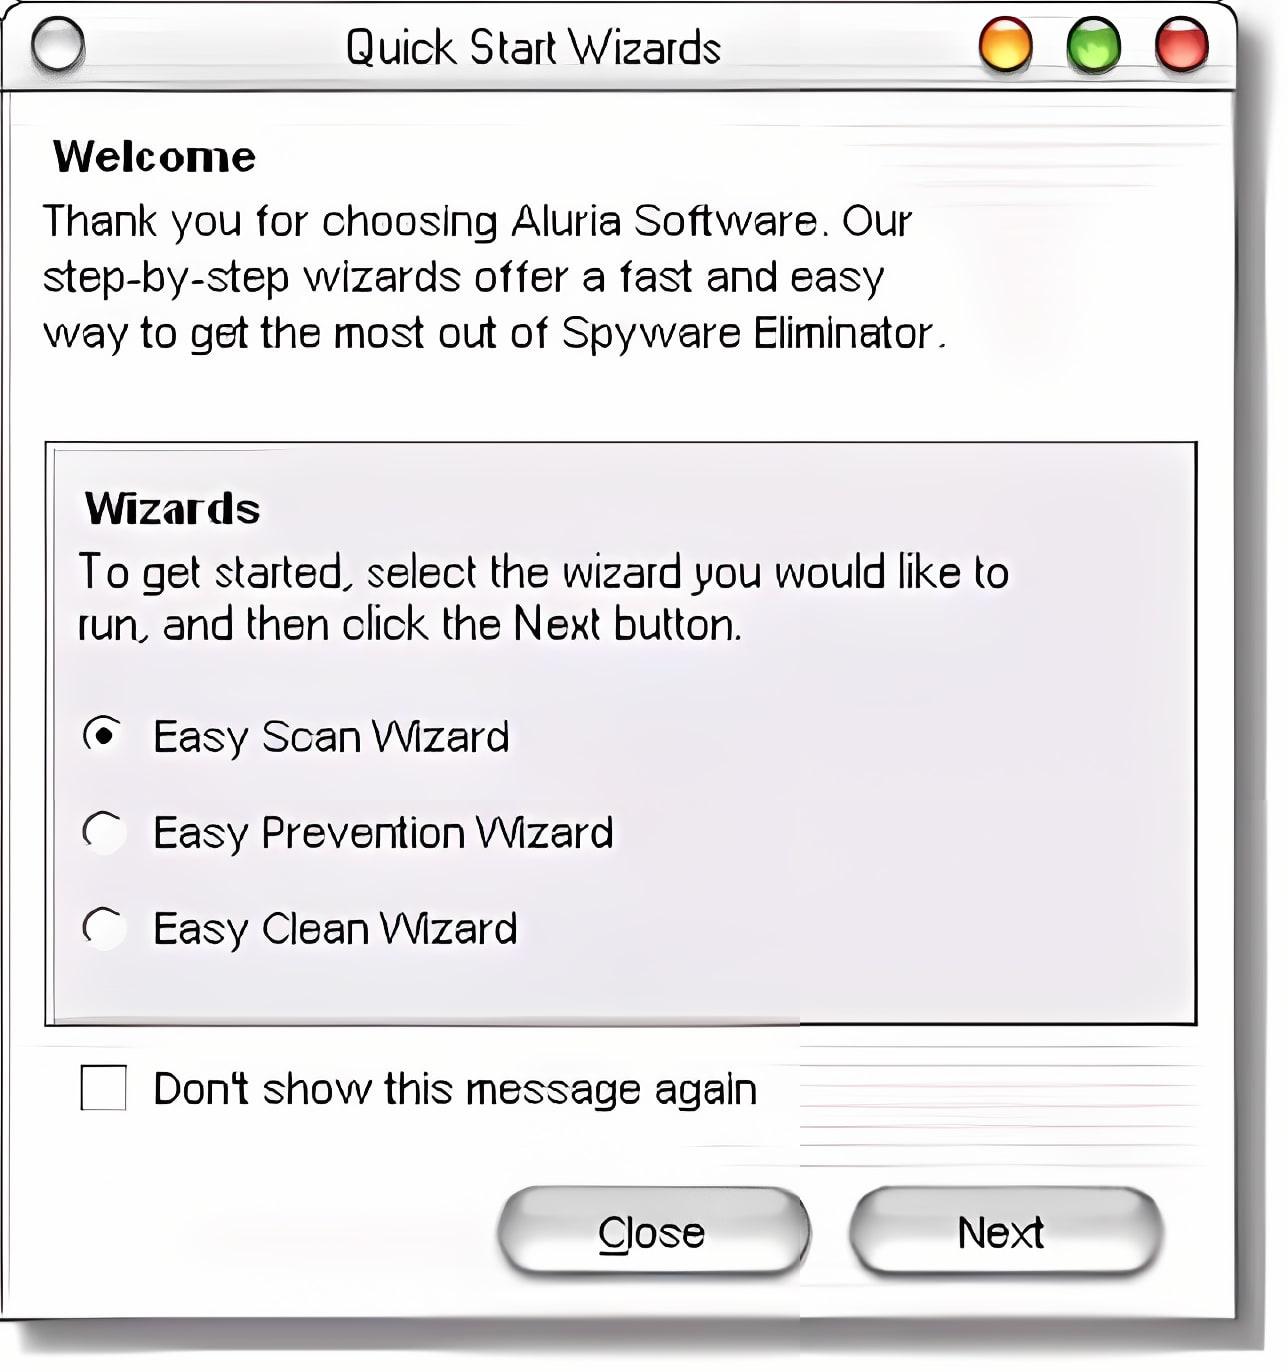 Aluria Spyware Eliminator